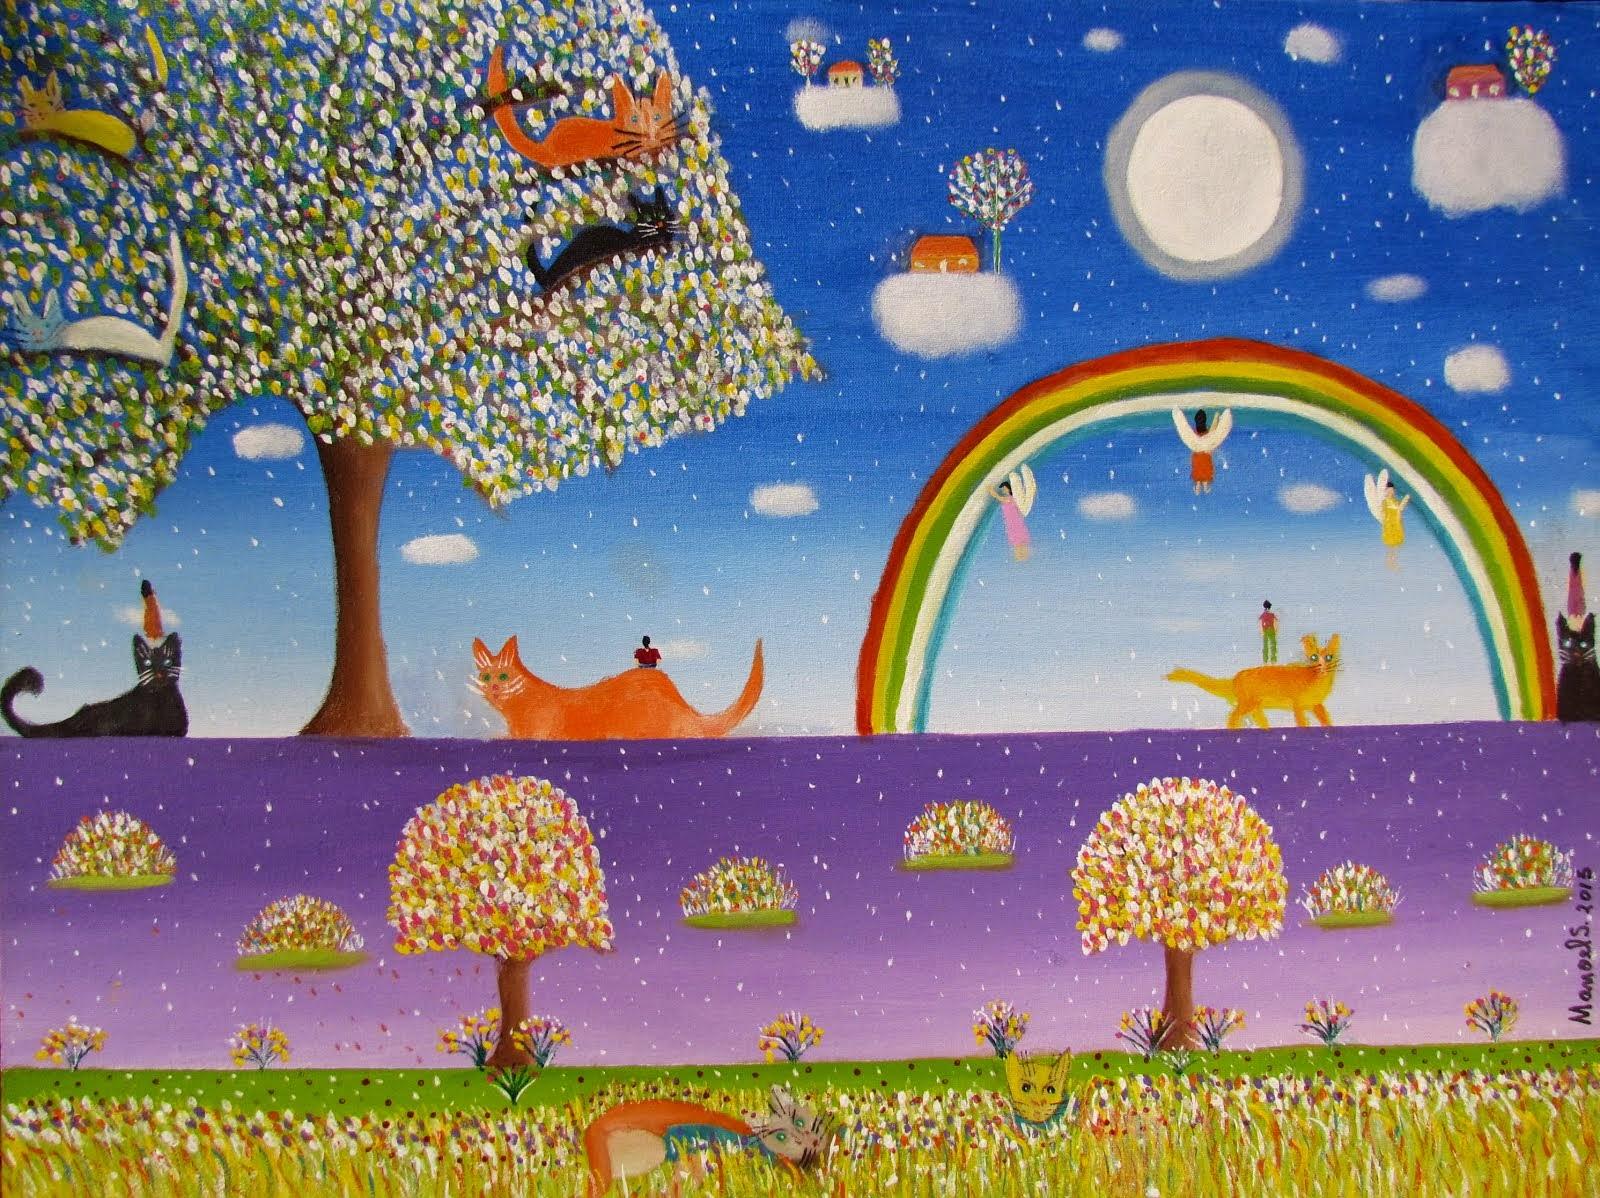 Pintando o Arco-íris - 2 Acrílica sob/tela 35x45